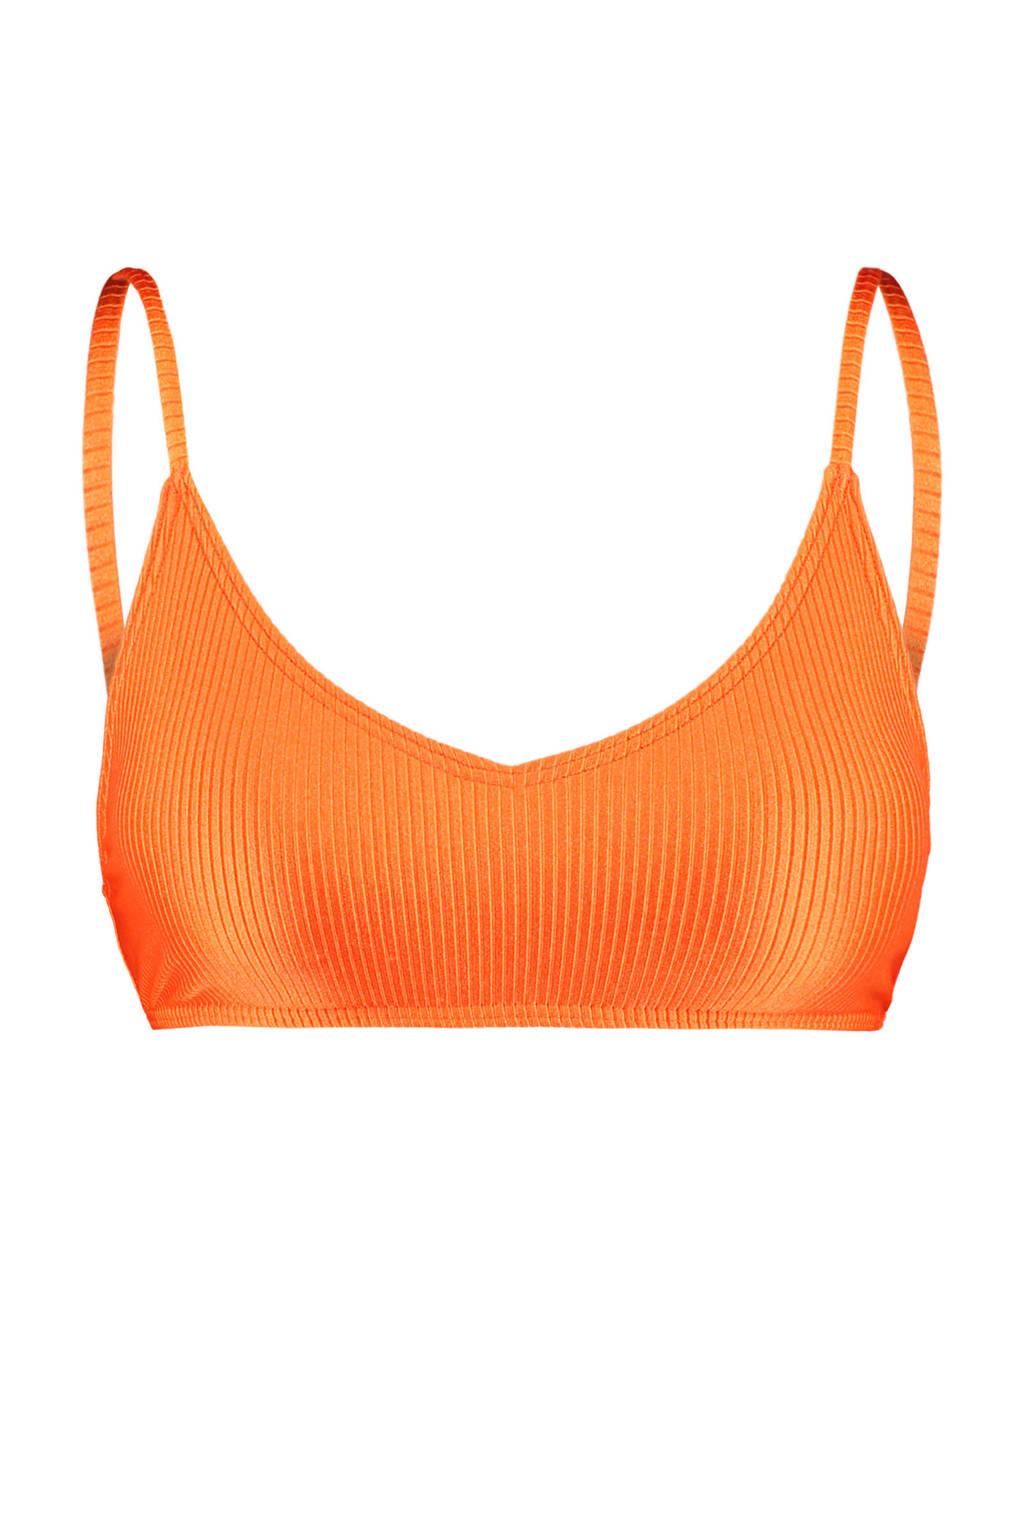 America Today bikinitop Apua met rib structuur oranje, Oranje